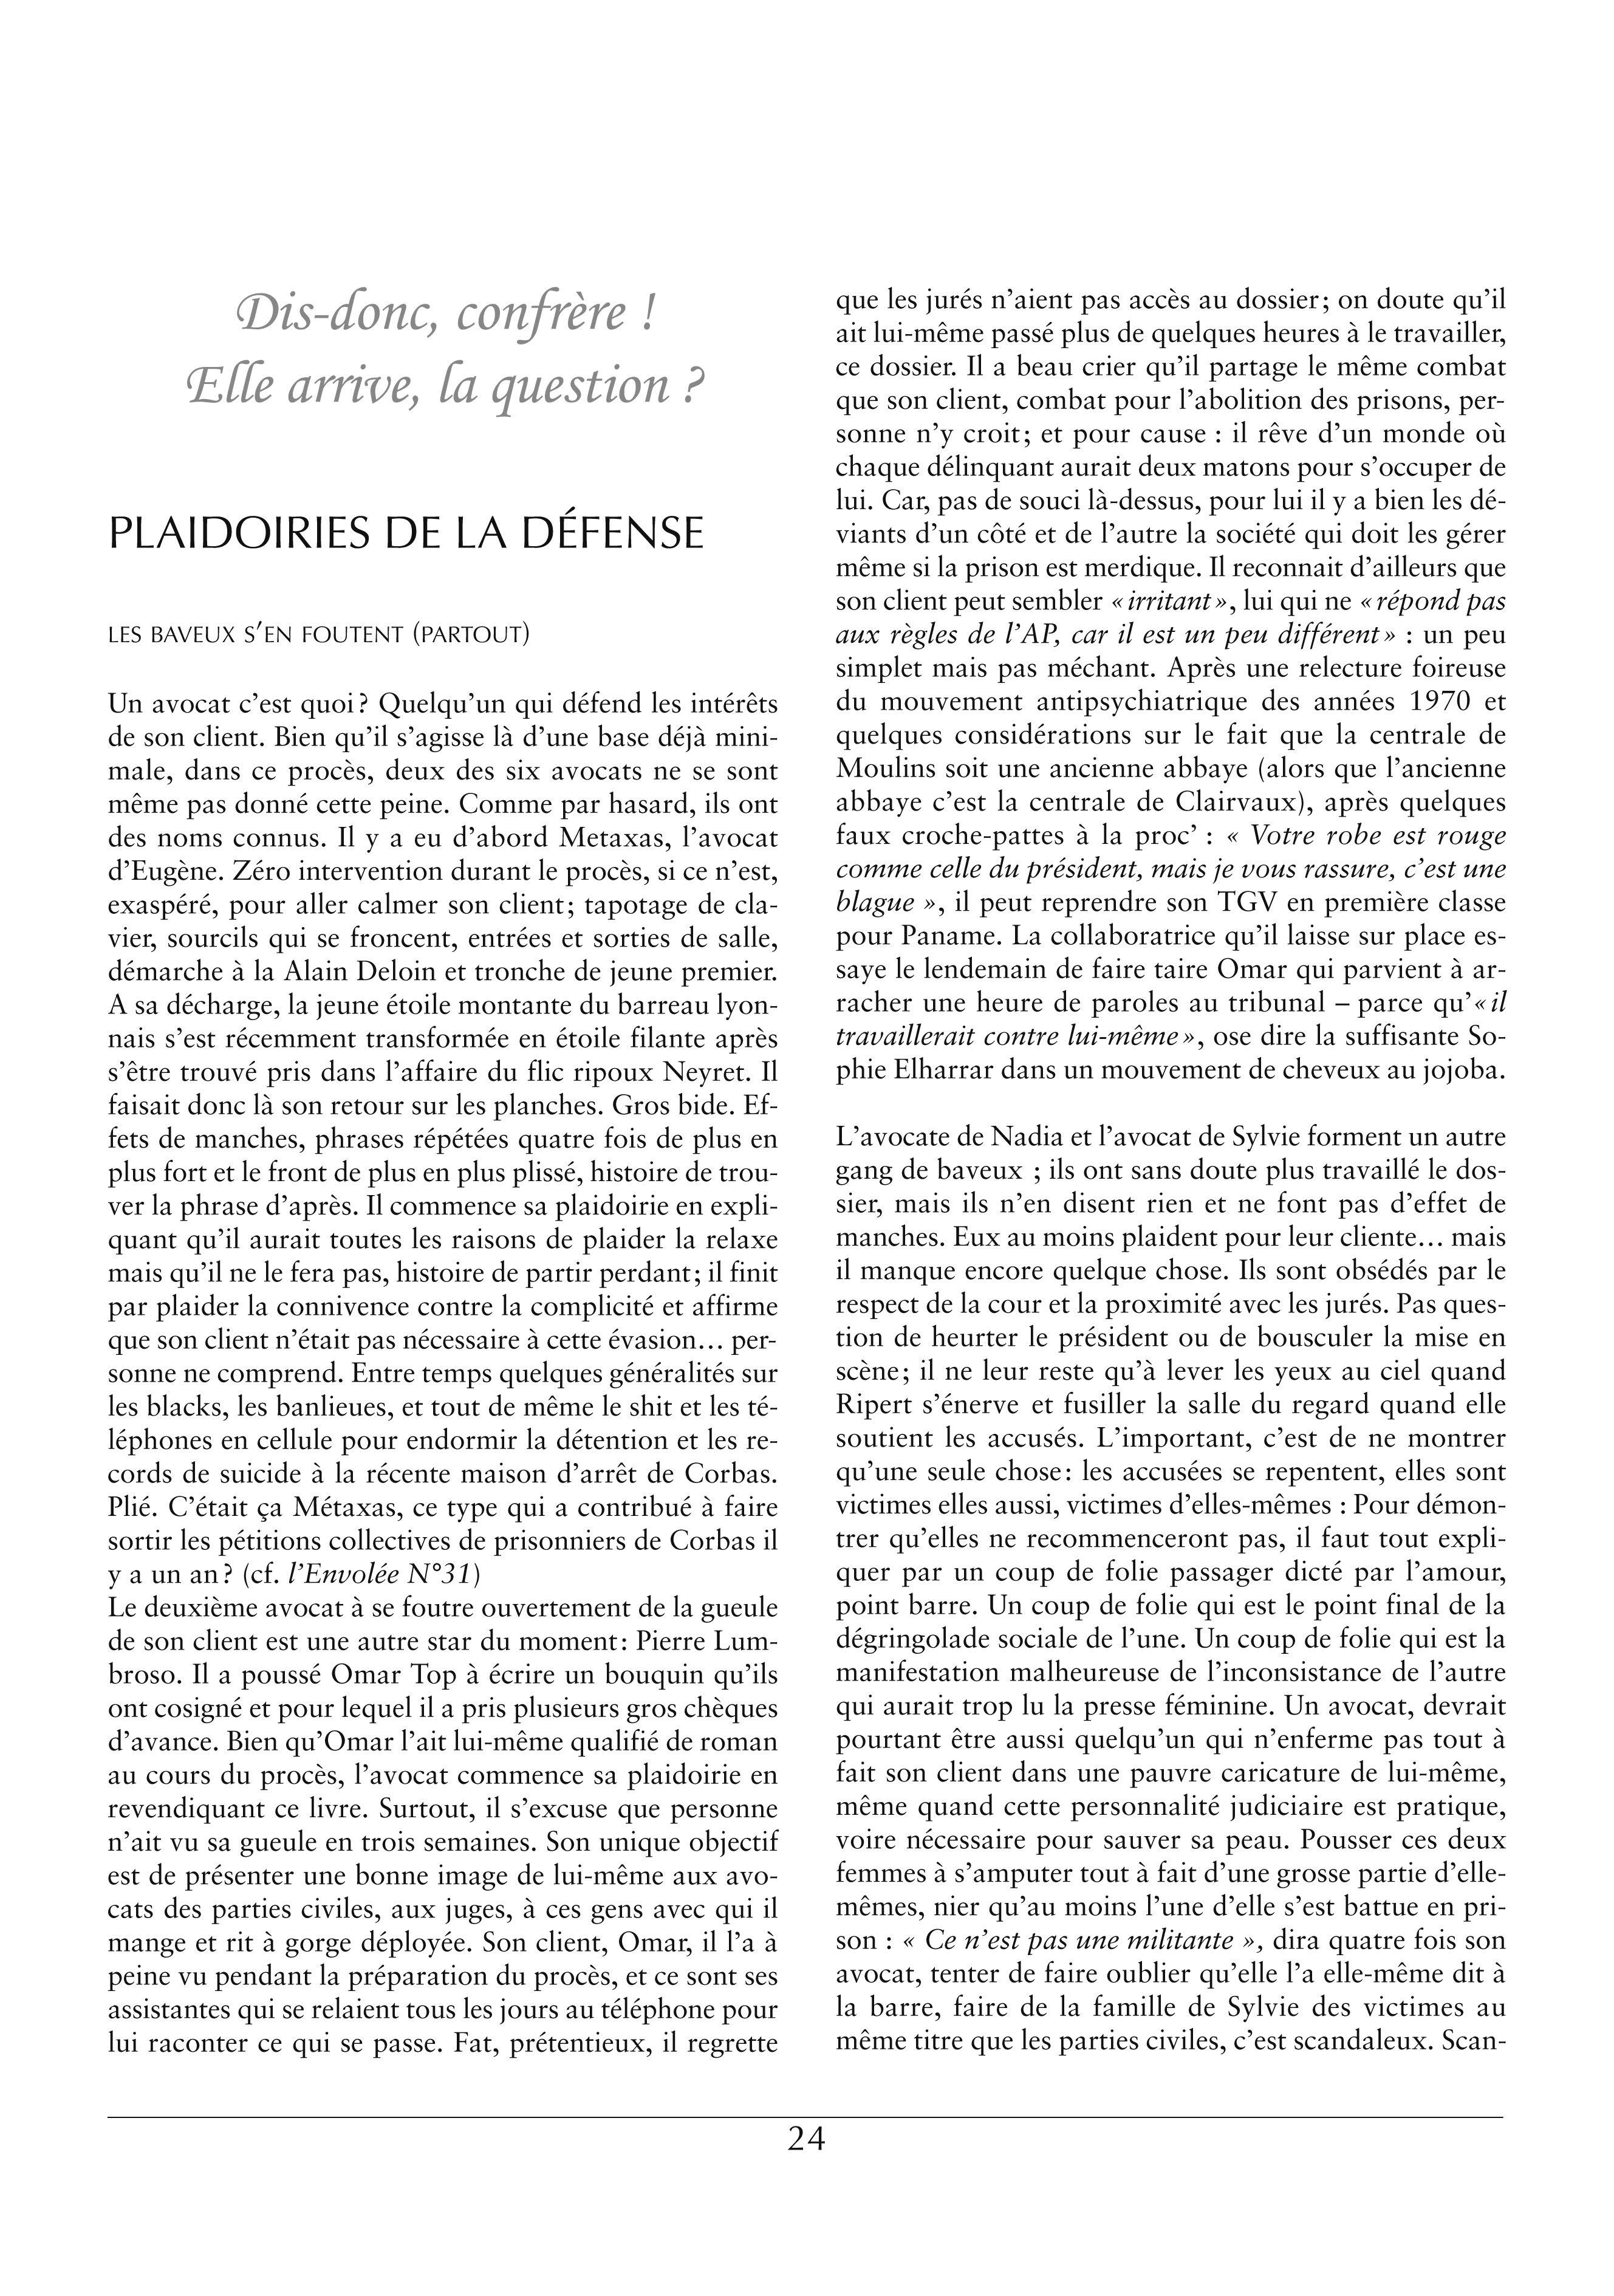 lenvolee_35 1_Page_24